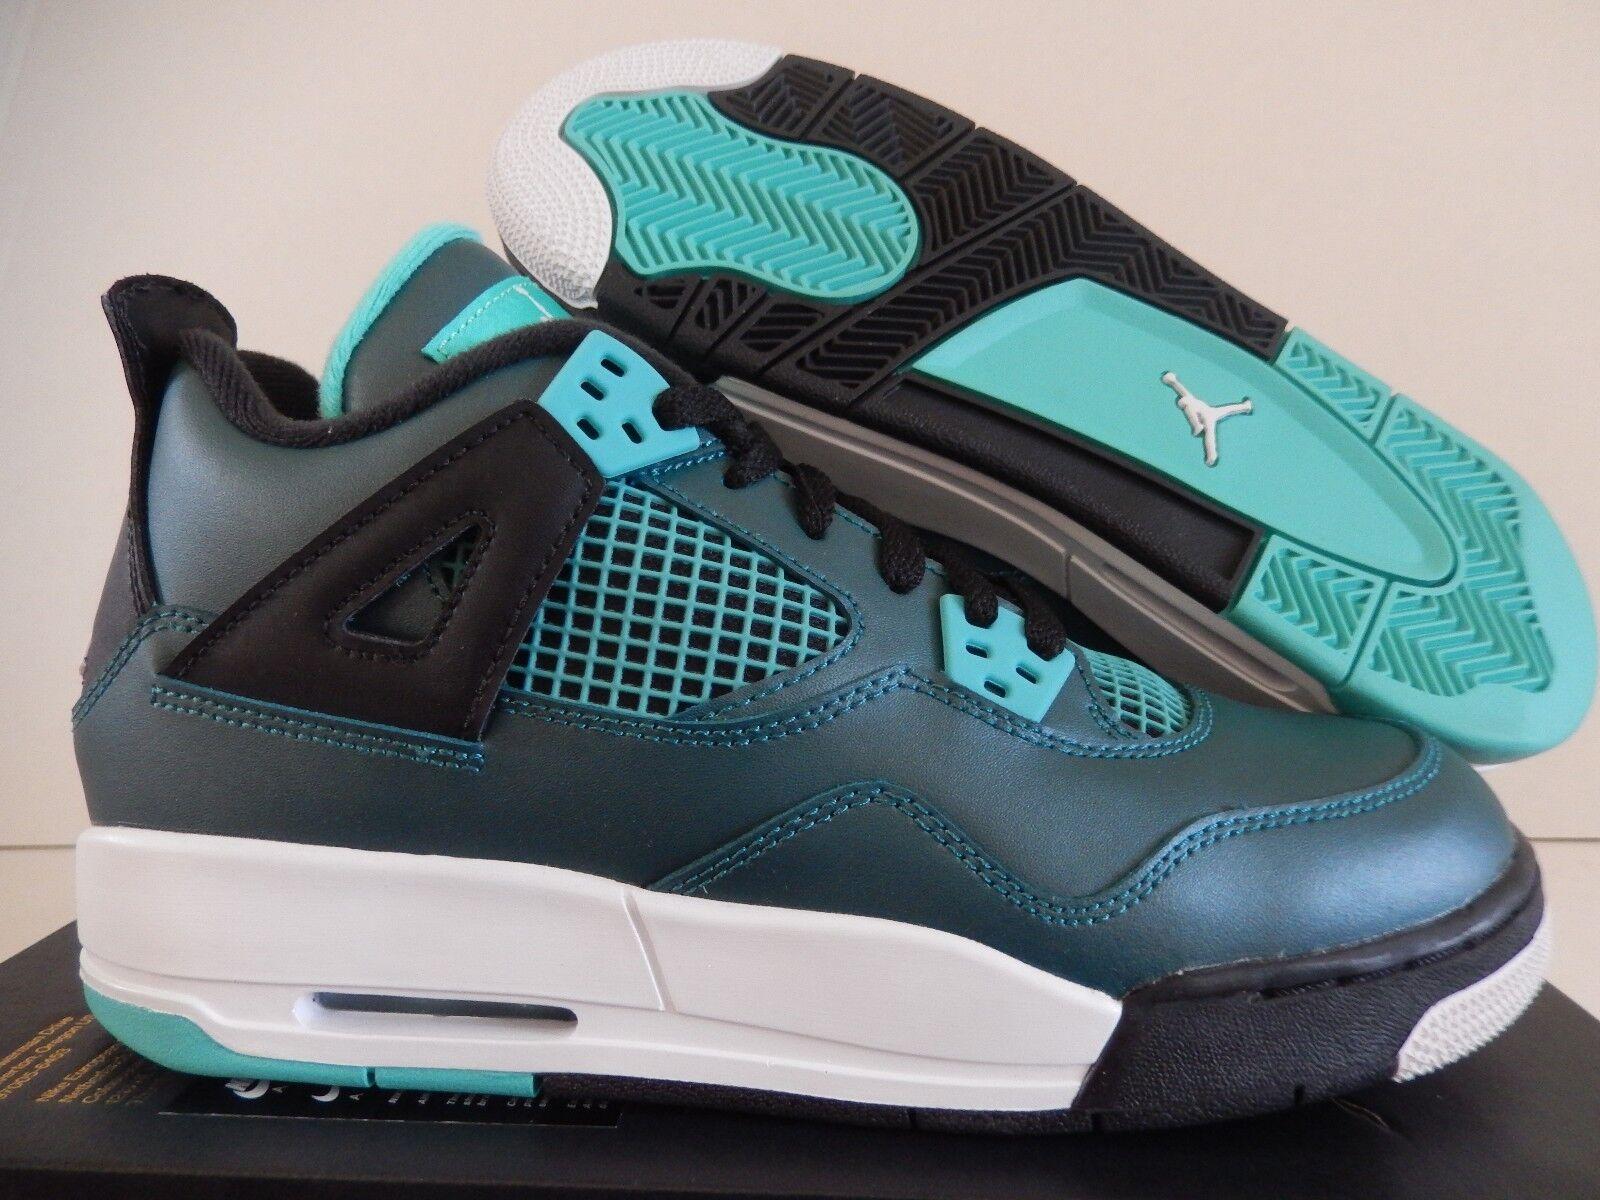 Nike air jordan 4 '30 bg teal-white-blk sz 7y-Donna sz - 705330-330]